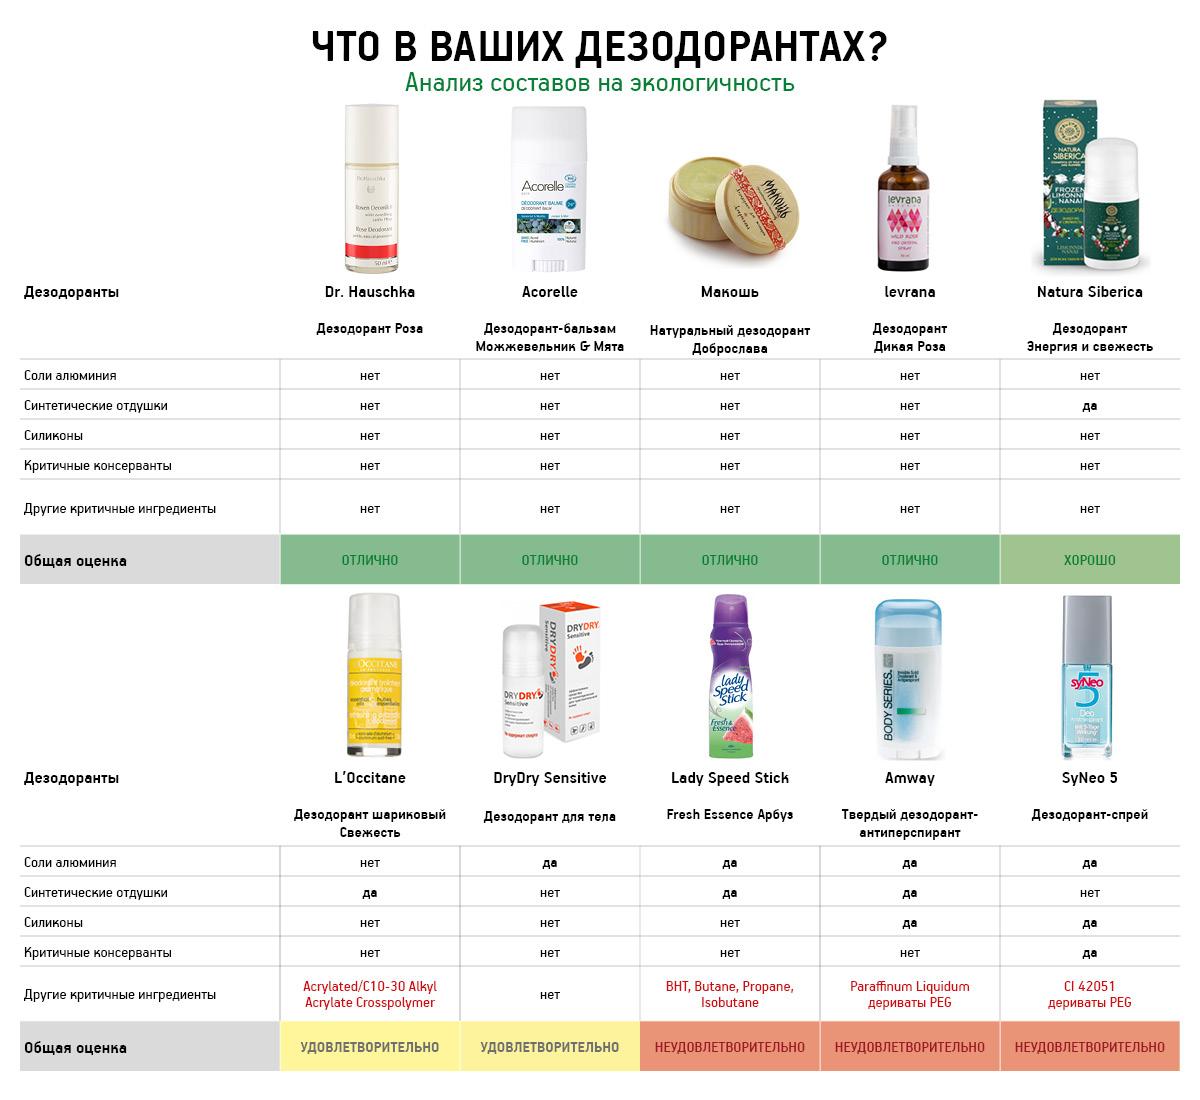 Таблица дезодоранты